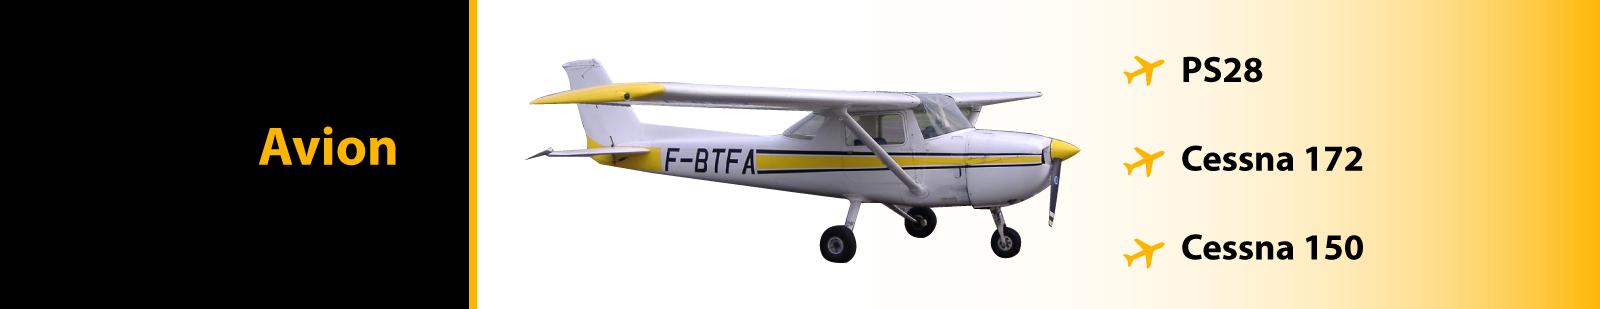 avion-cc